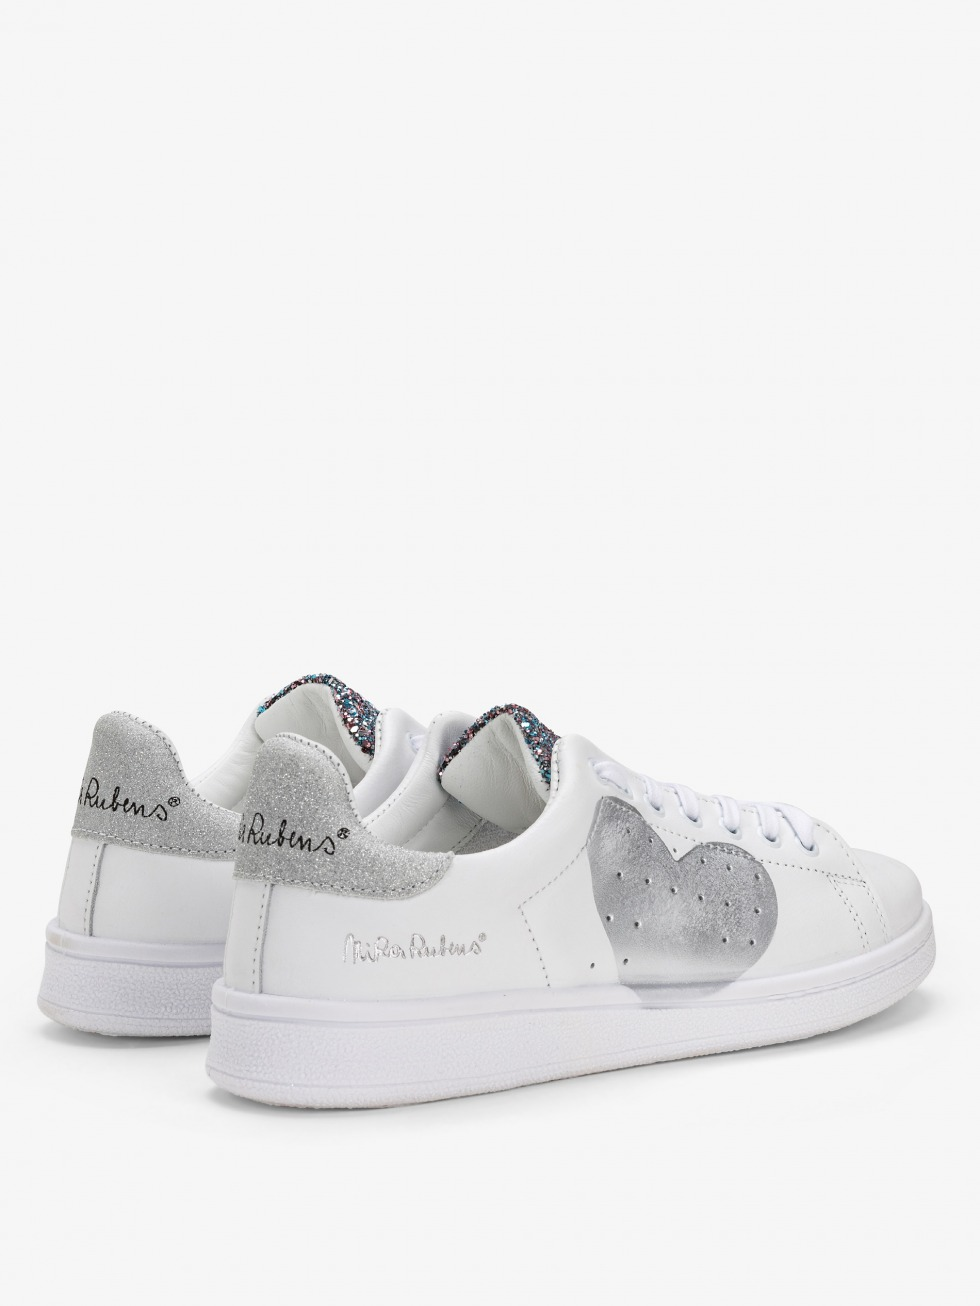 Daiquiri Sneakers - Shiny Silver Heart